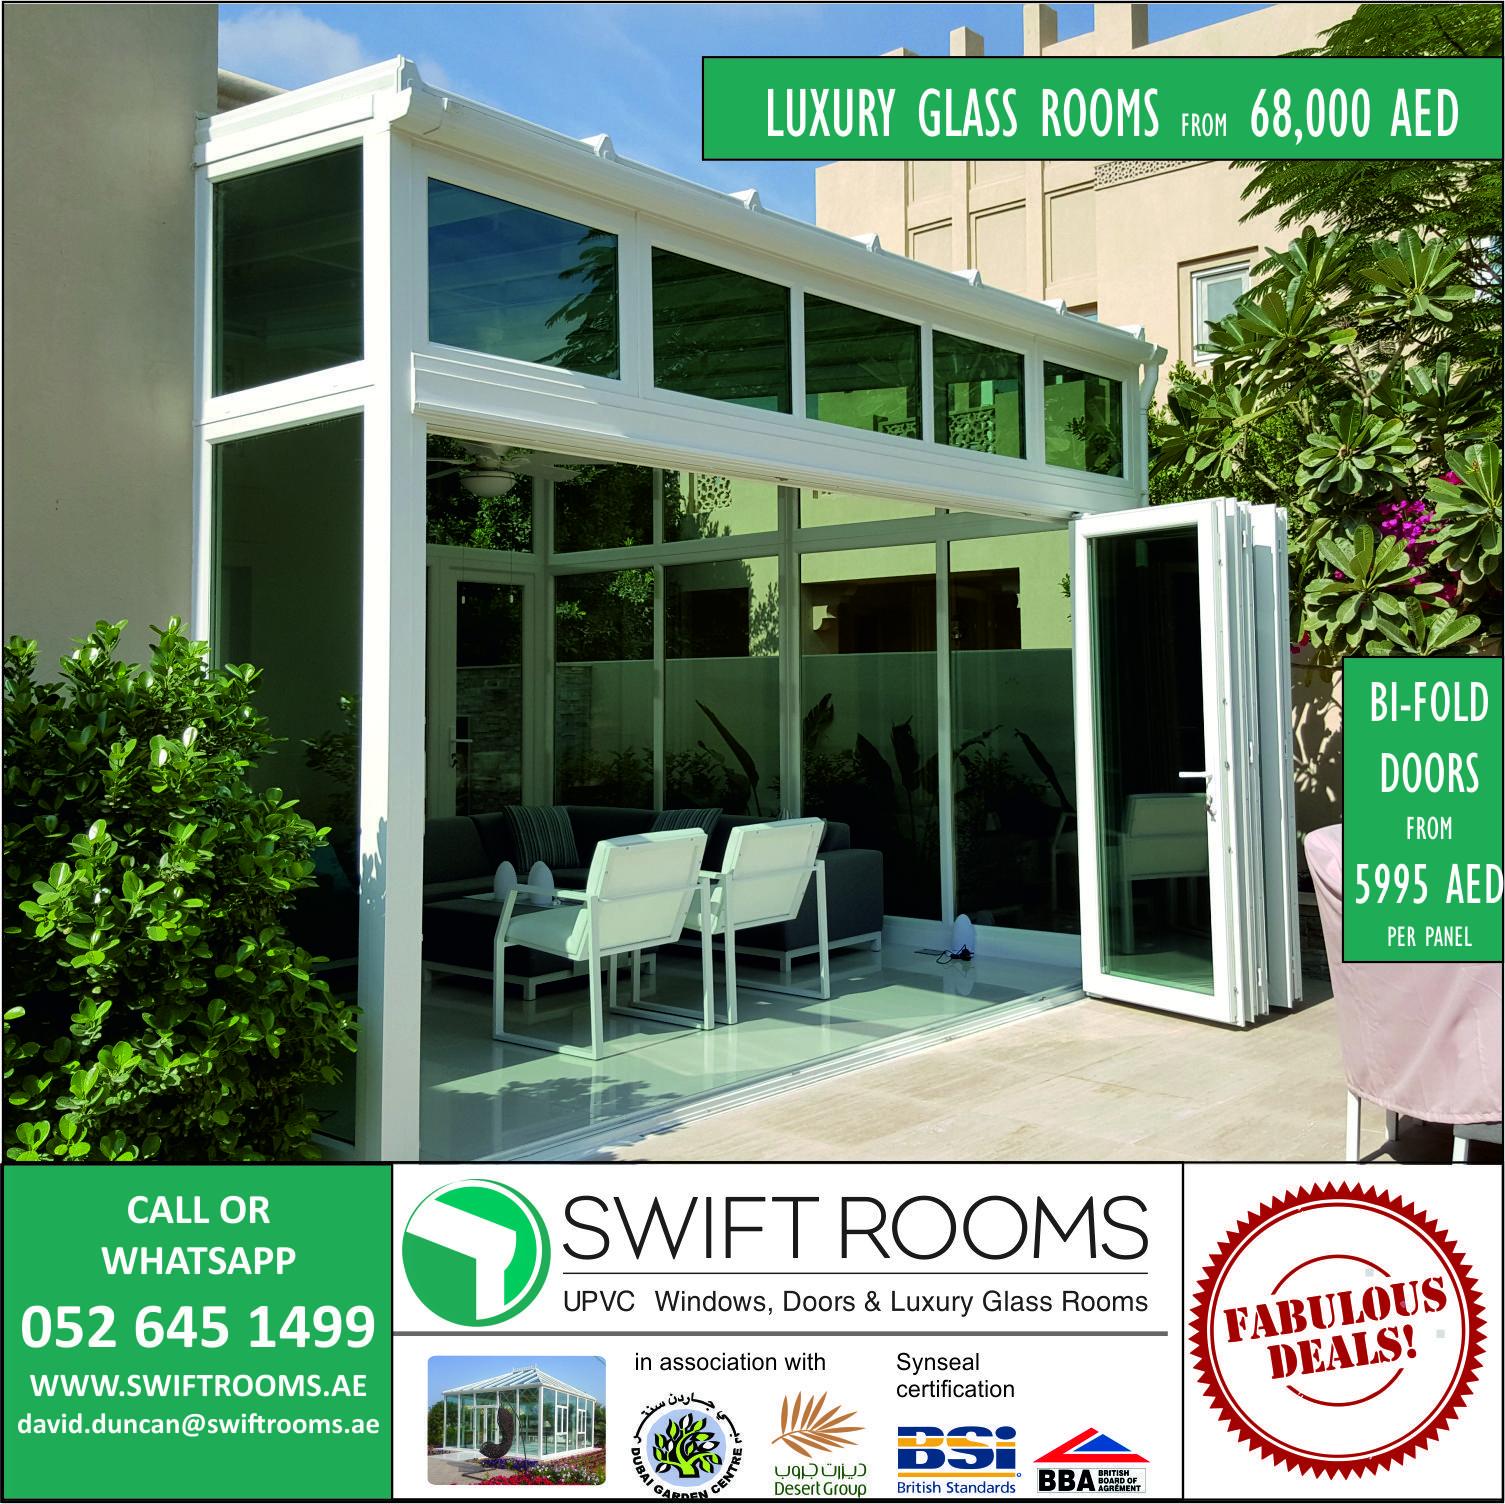 luxury glass rooms, majlis, conservatories in Dubai #dubai ...